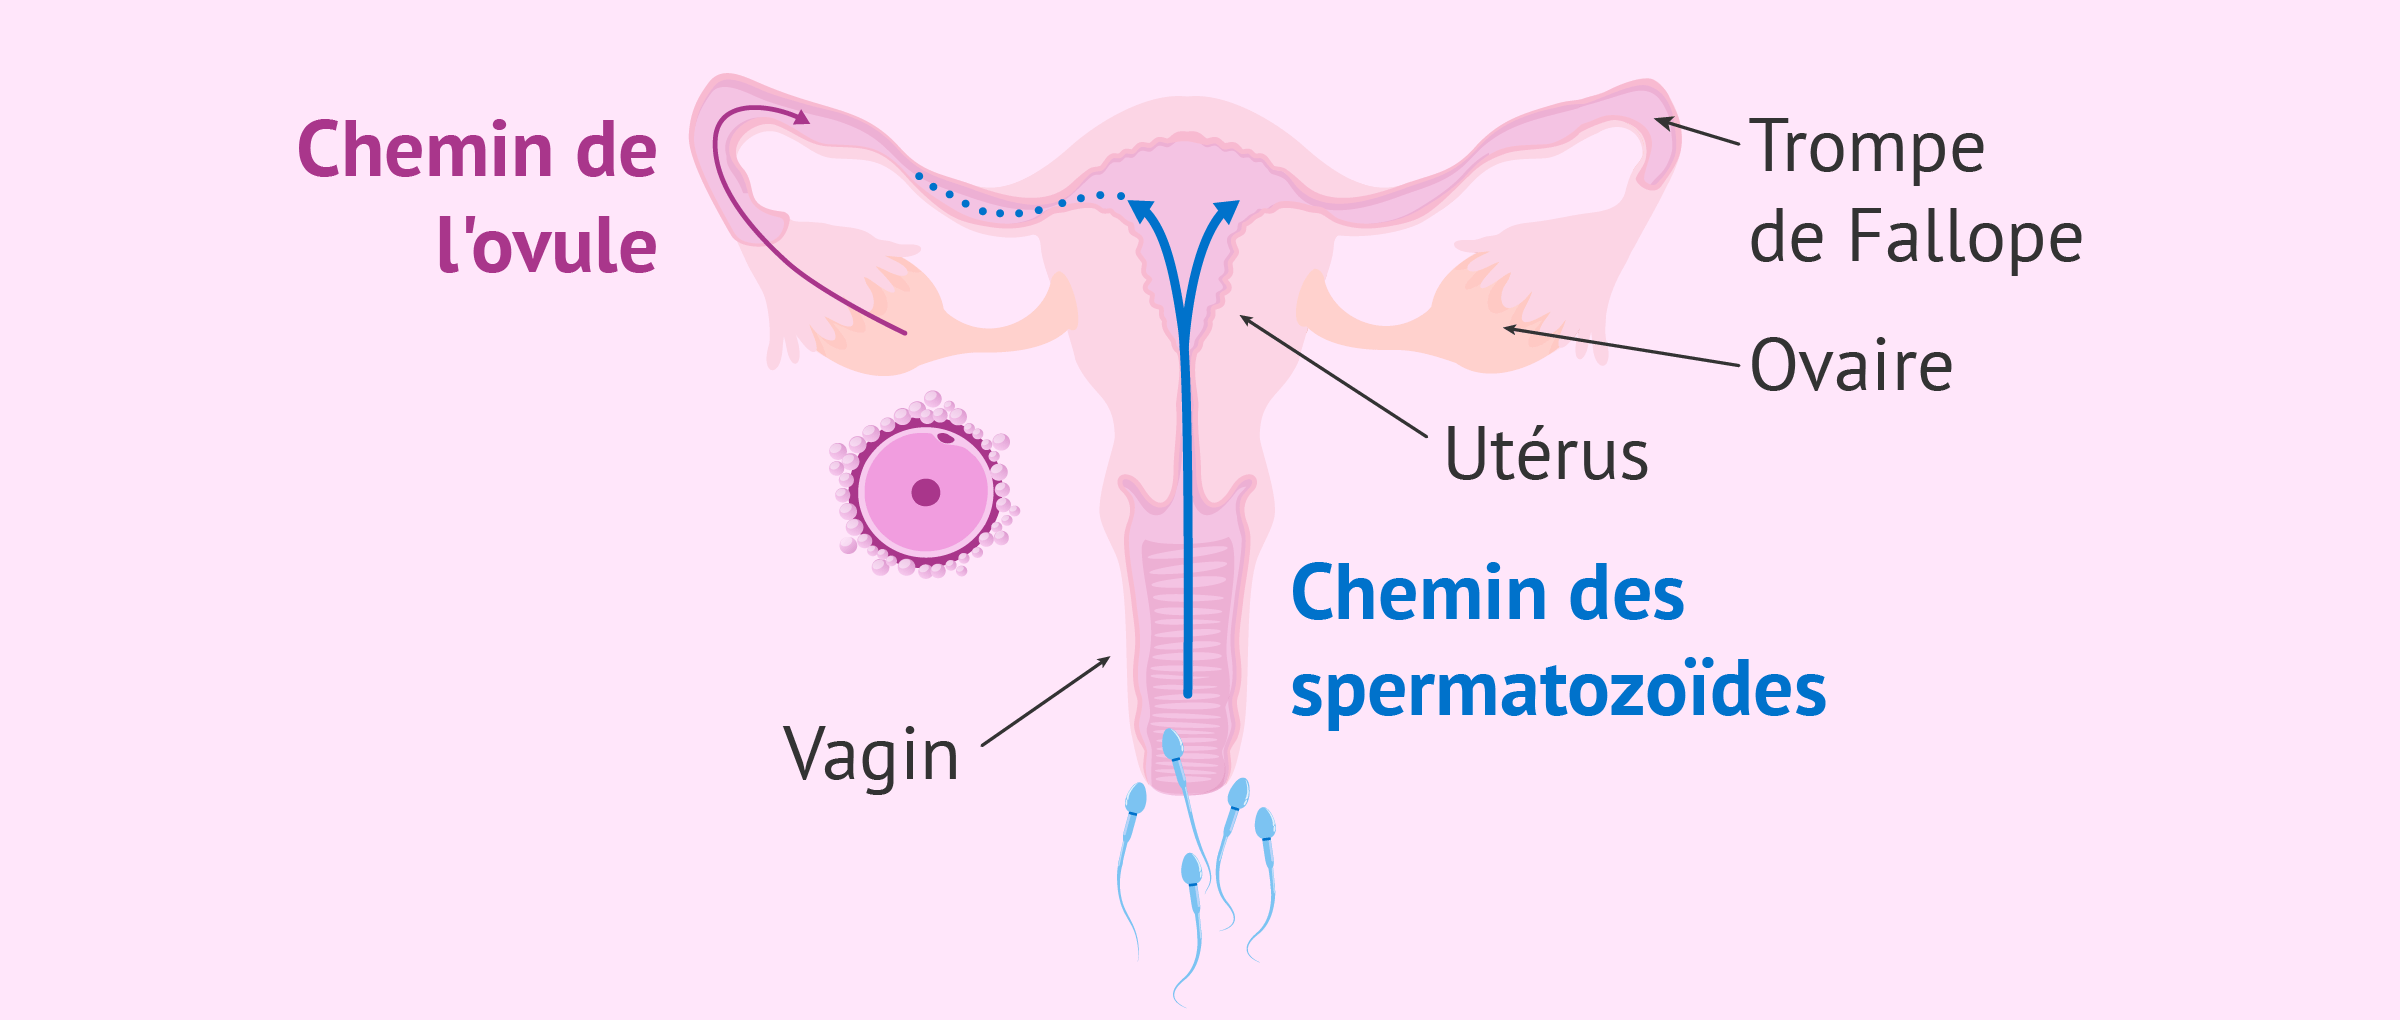 La grossesse naturelle